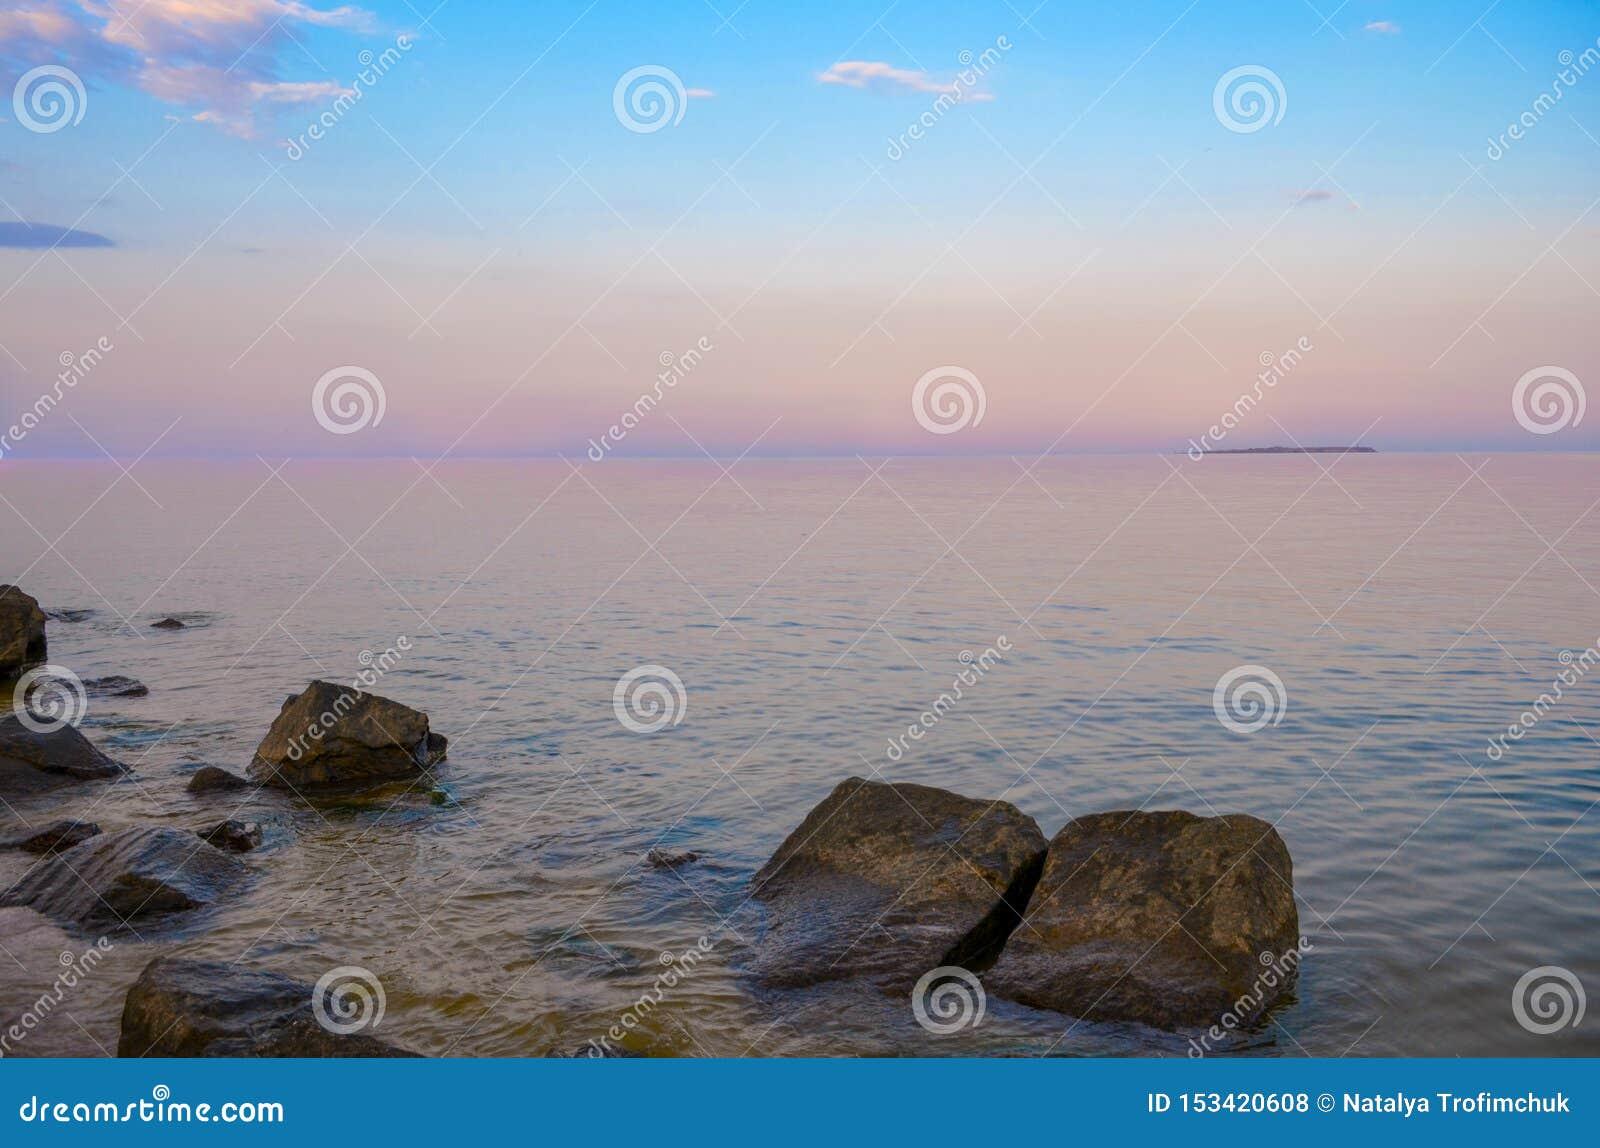 Purple Dusk. Beautiful clouds over the calm sea. Pink sunset on the sea